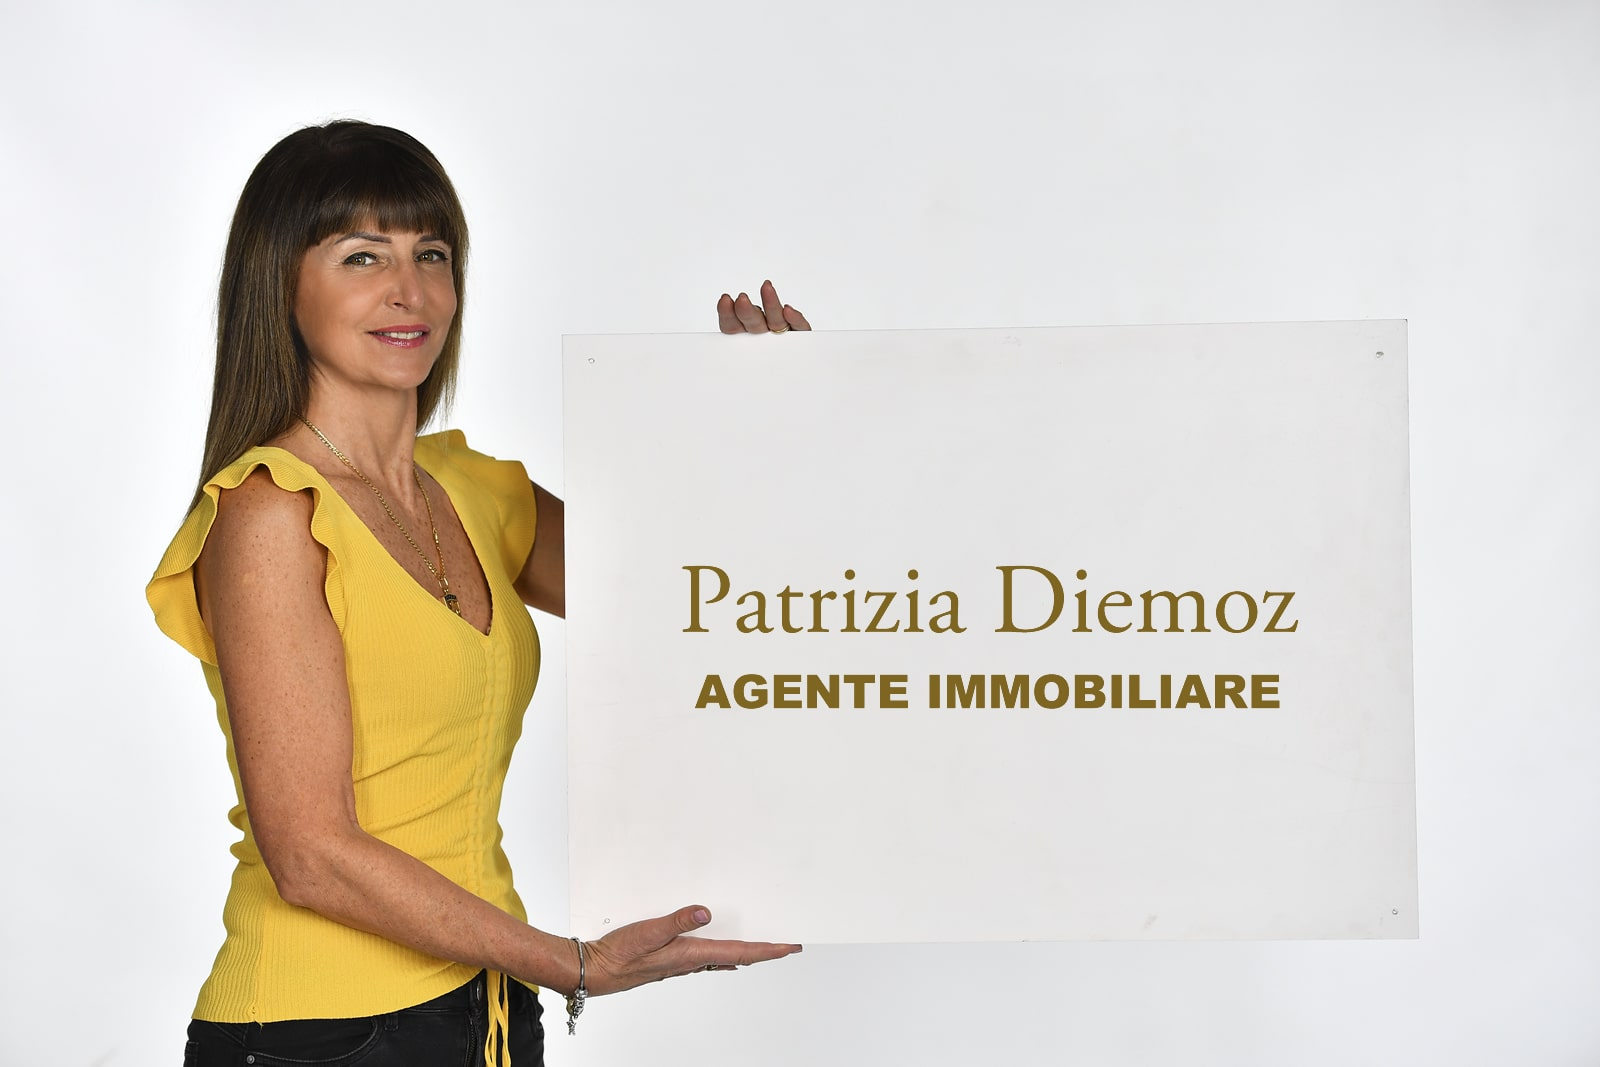 Patrizia Diemoz